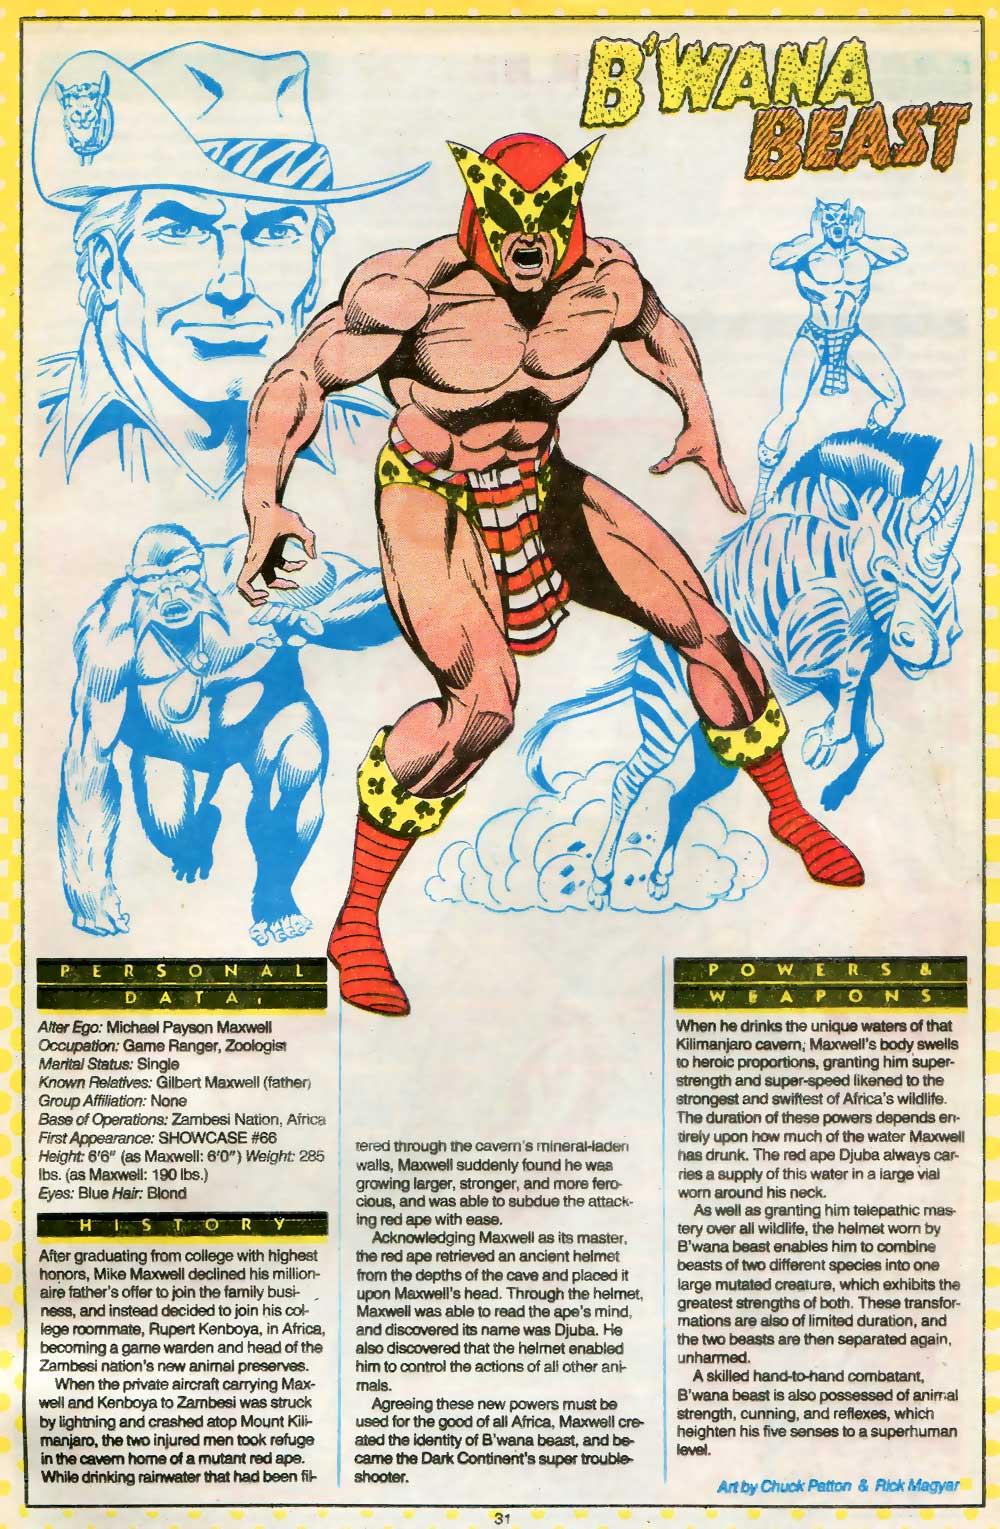 B'wana Beast in Who's Who 1985